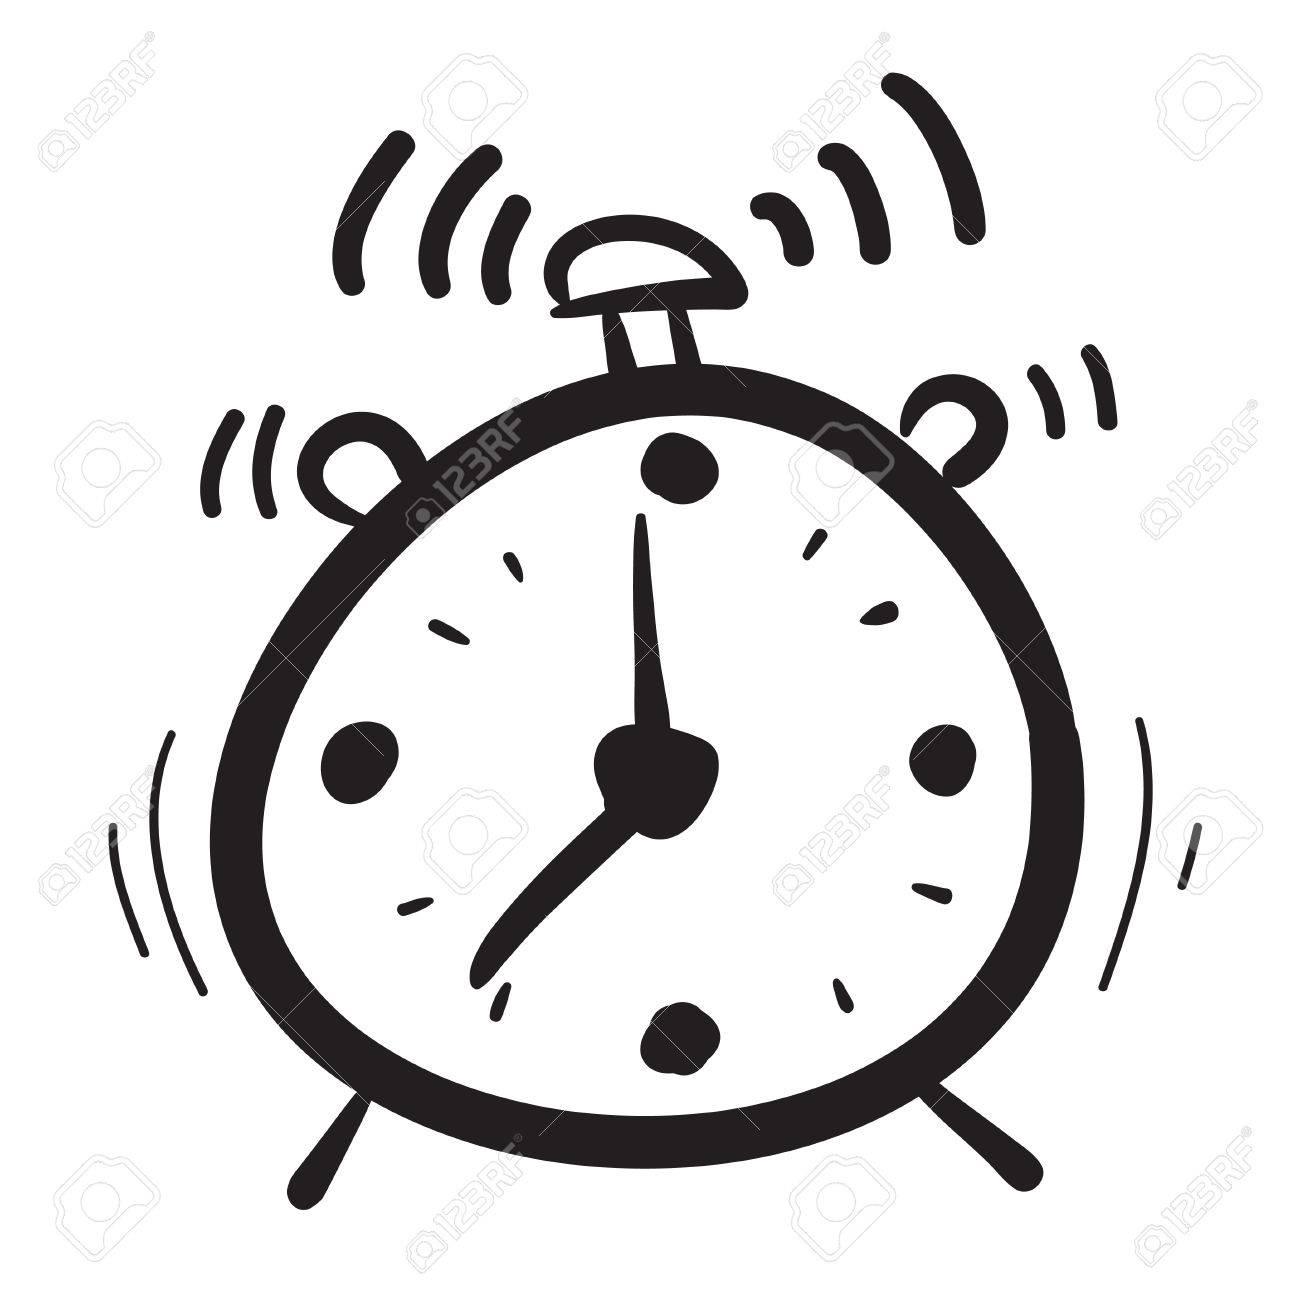 hand drawn clock icons set illustration watches time morning rh 123rf com